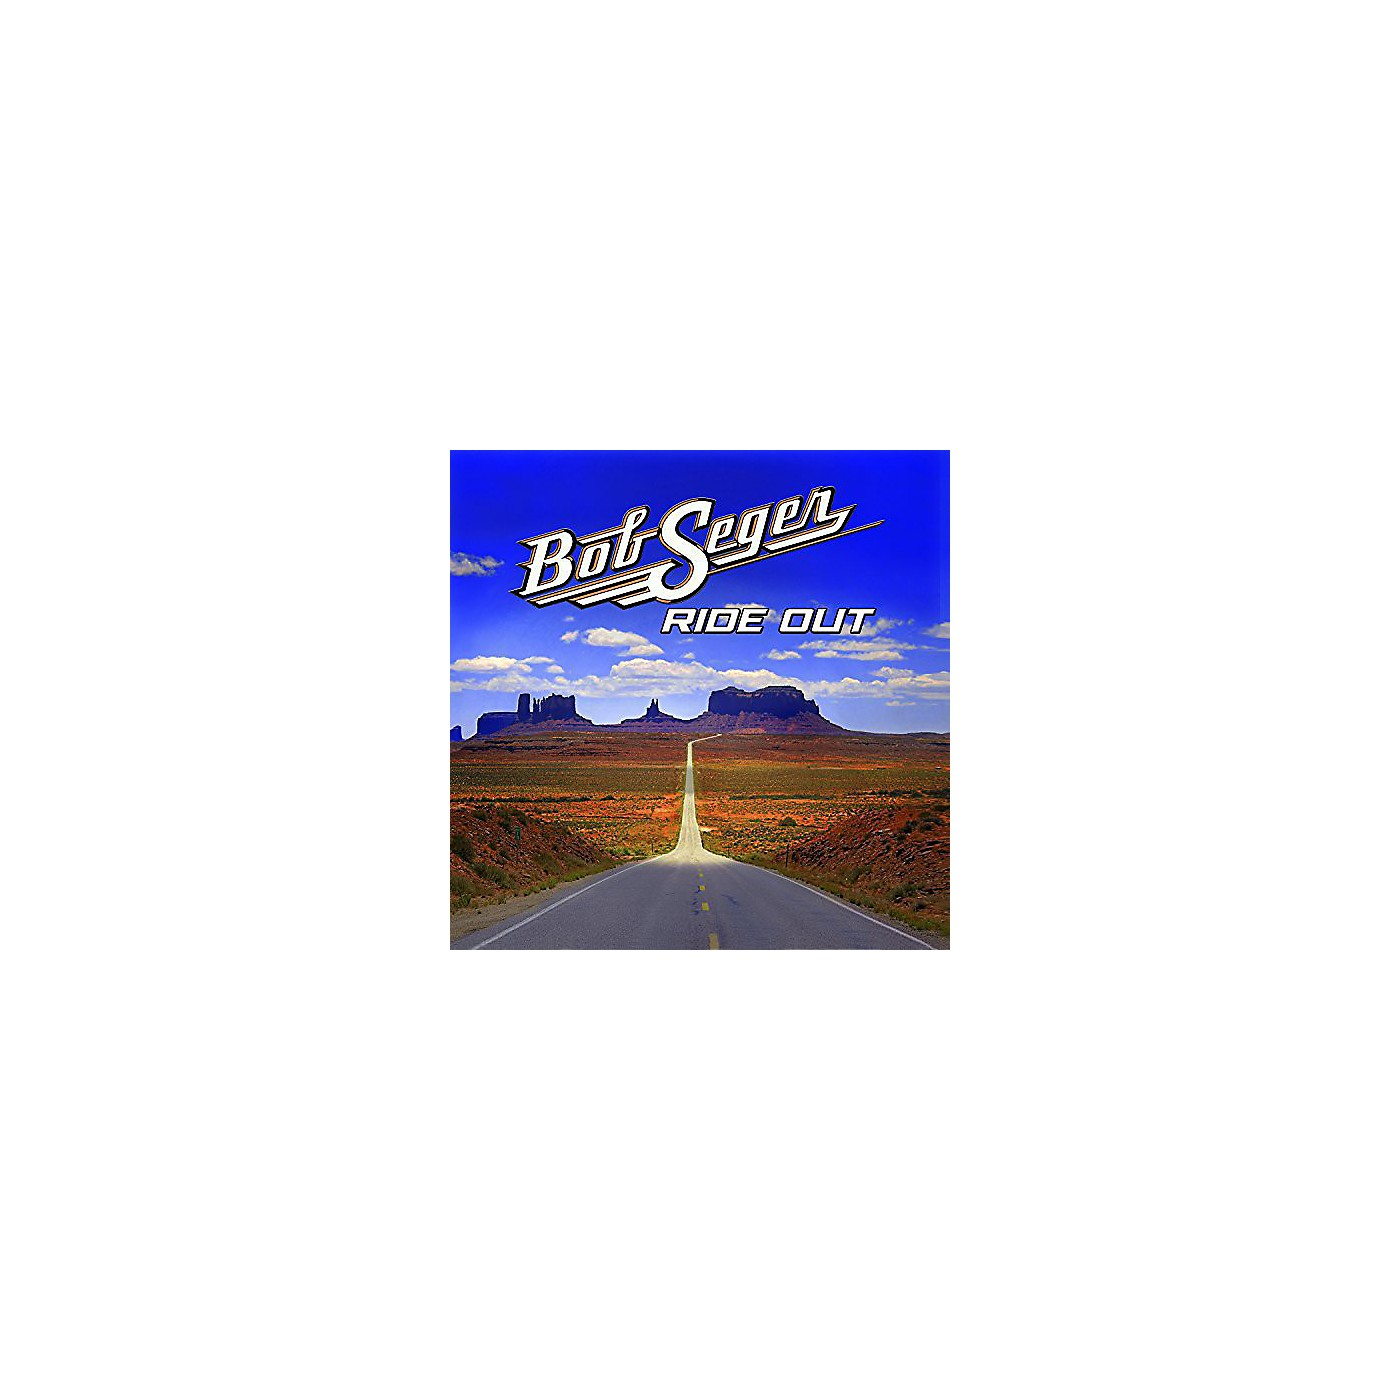 Alliance Bob Seger - Ride Out thumbnail